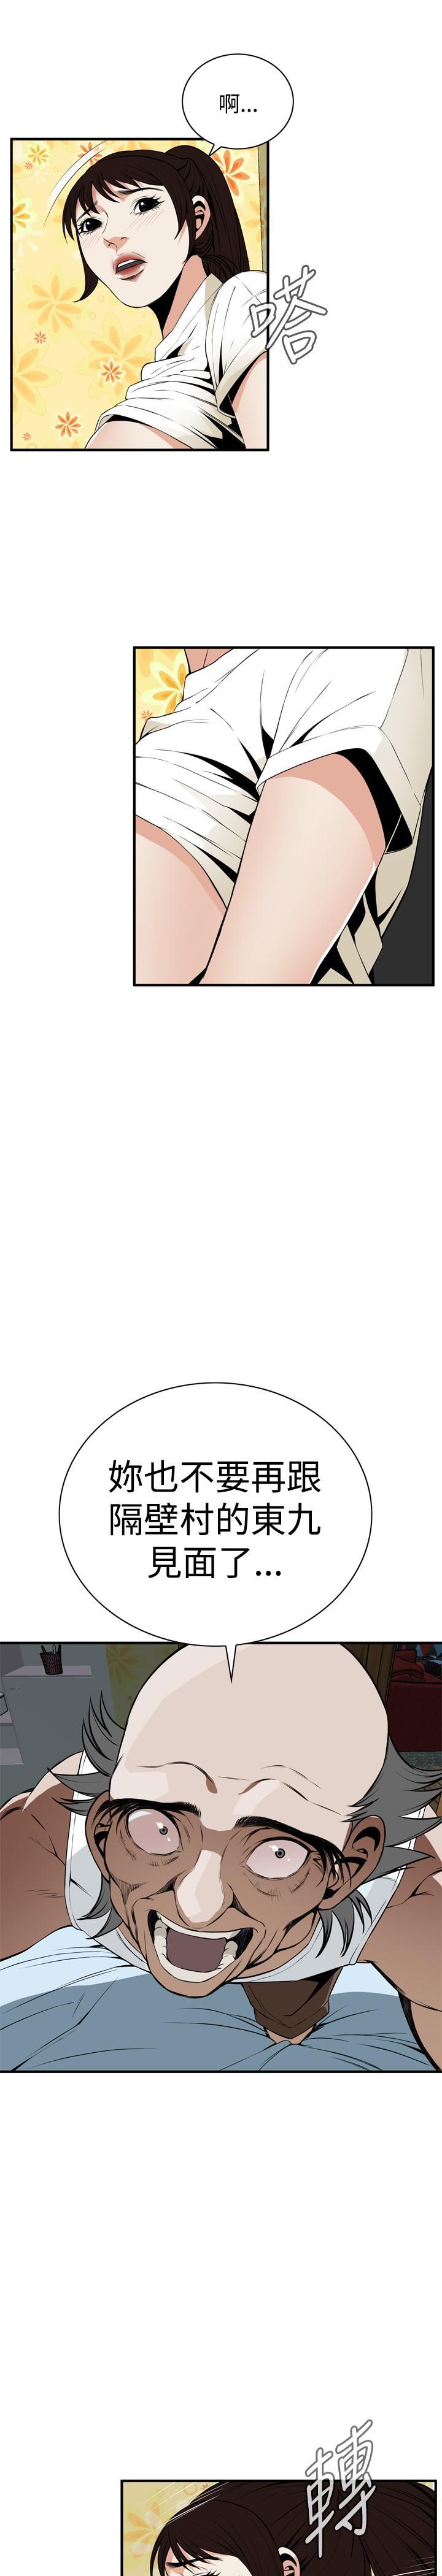 Take a Peek 偷窥 Ch.39~51 [Chinese]中文 8